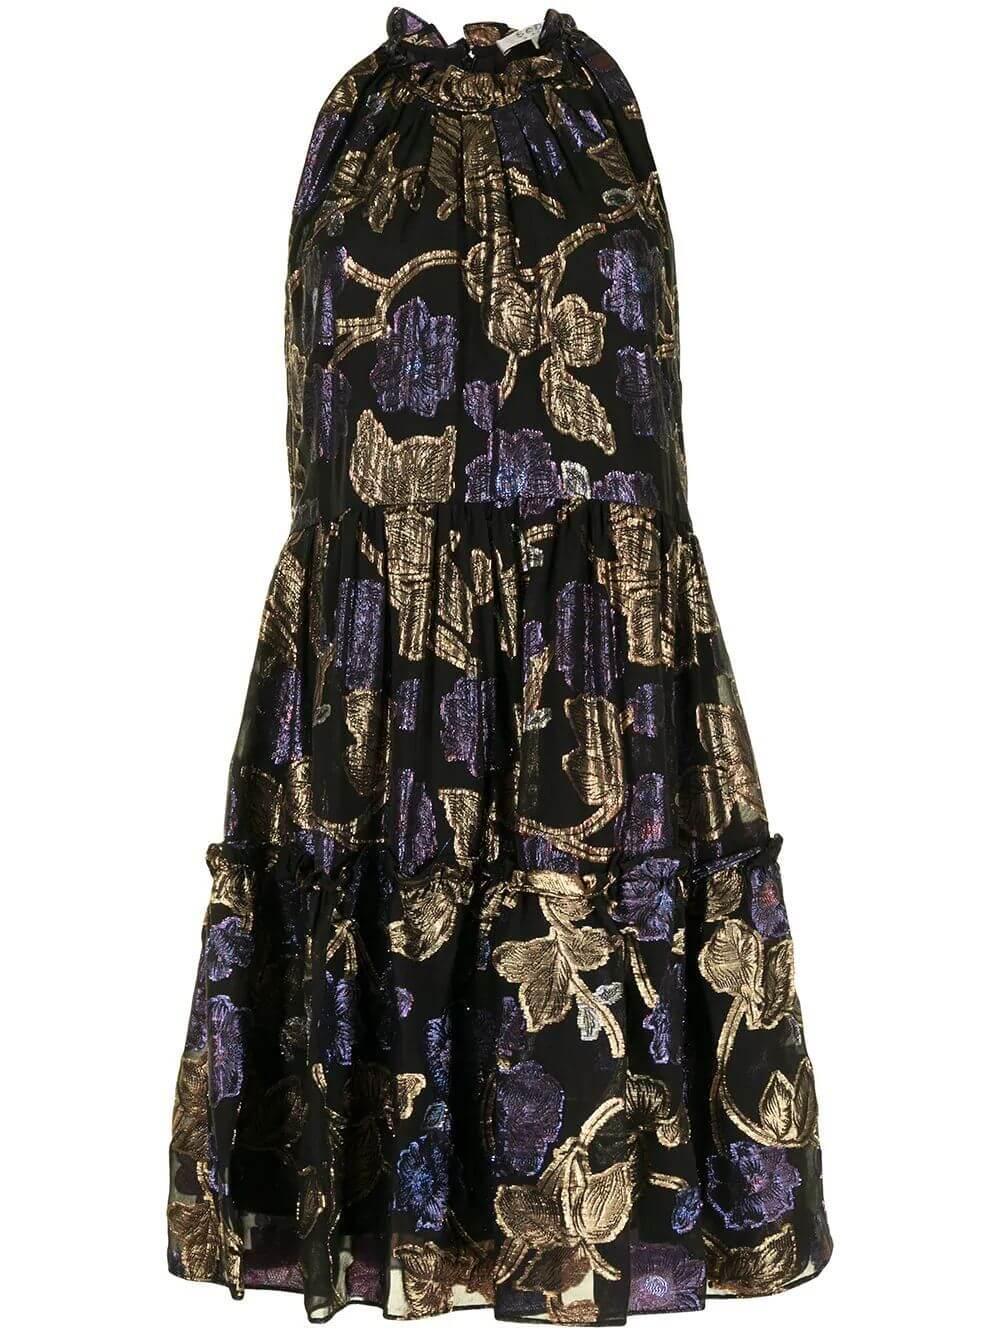 Lurex Halter Tunic Dress Item # RS21-16